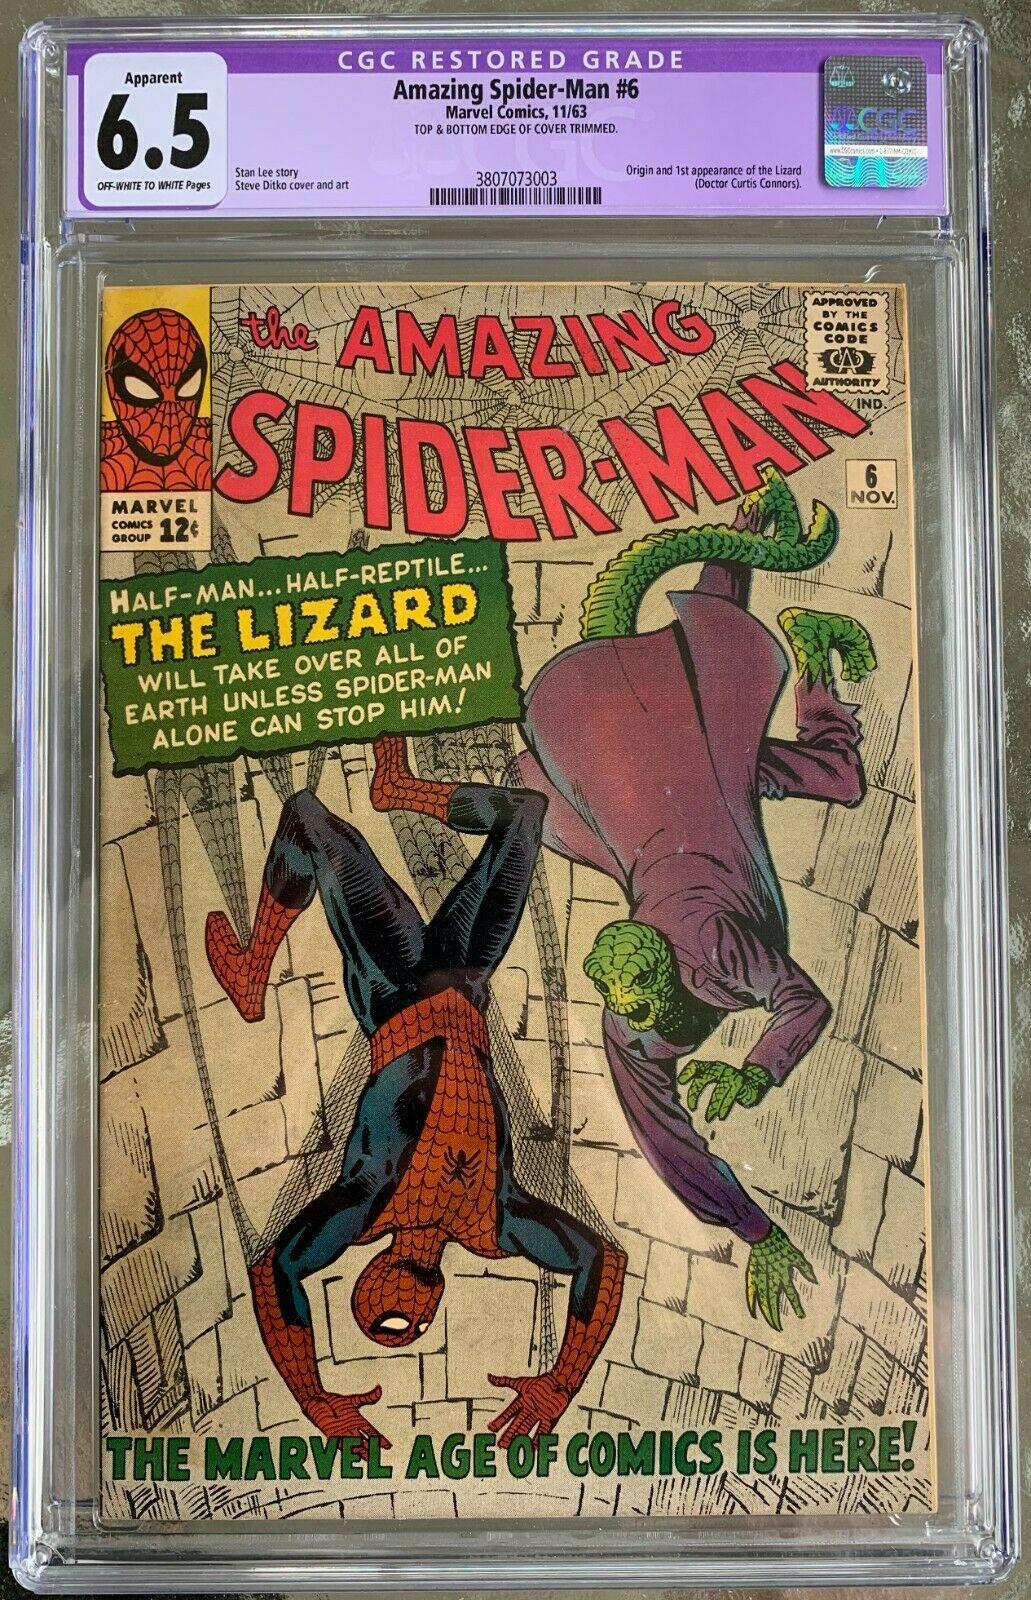 Amazing Spider-Man #6 CGC 6.5 ow/w